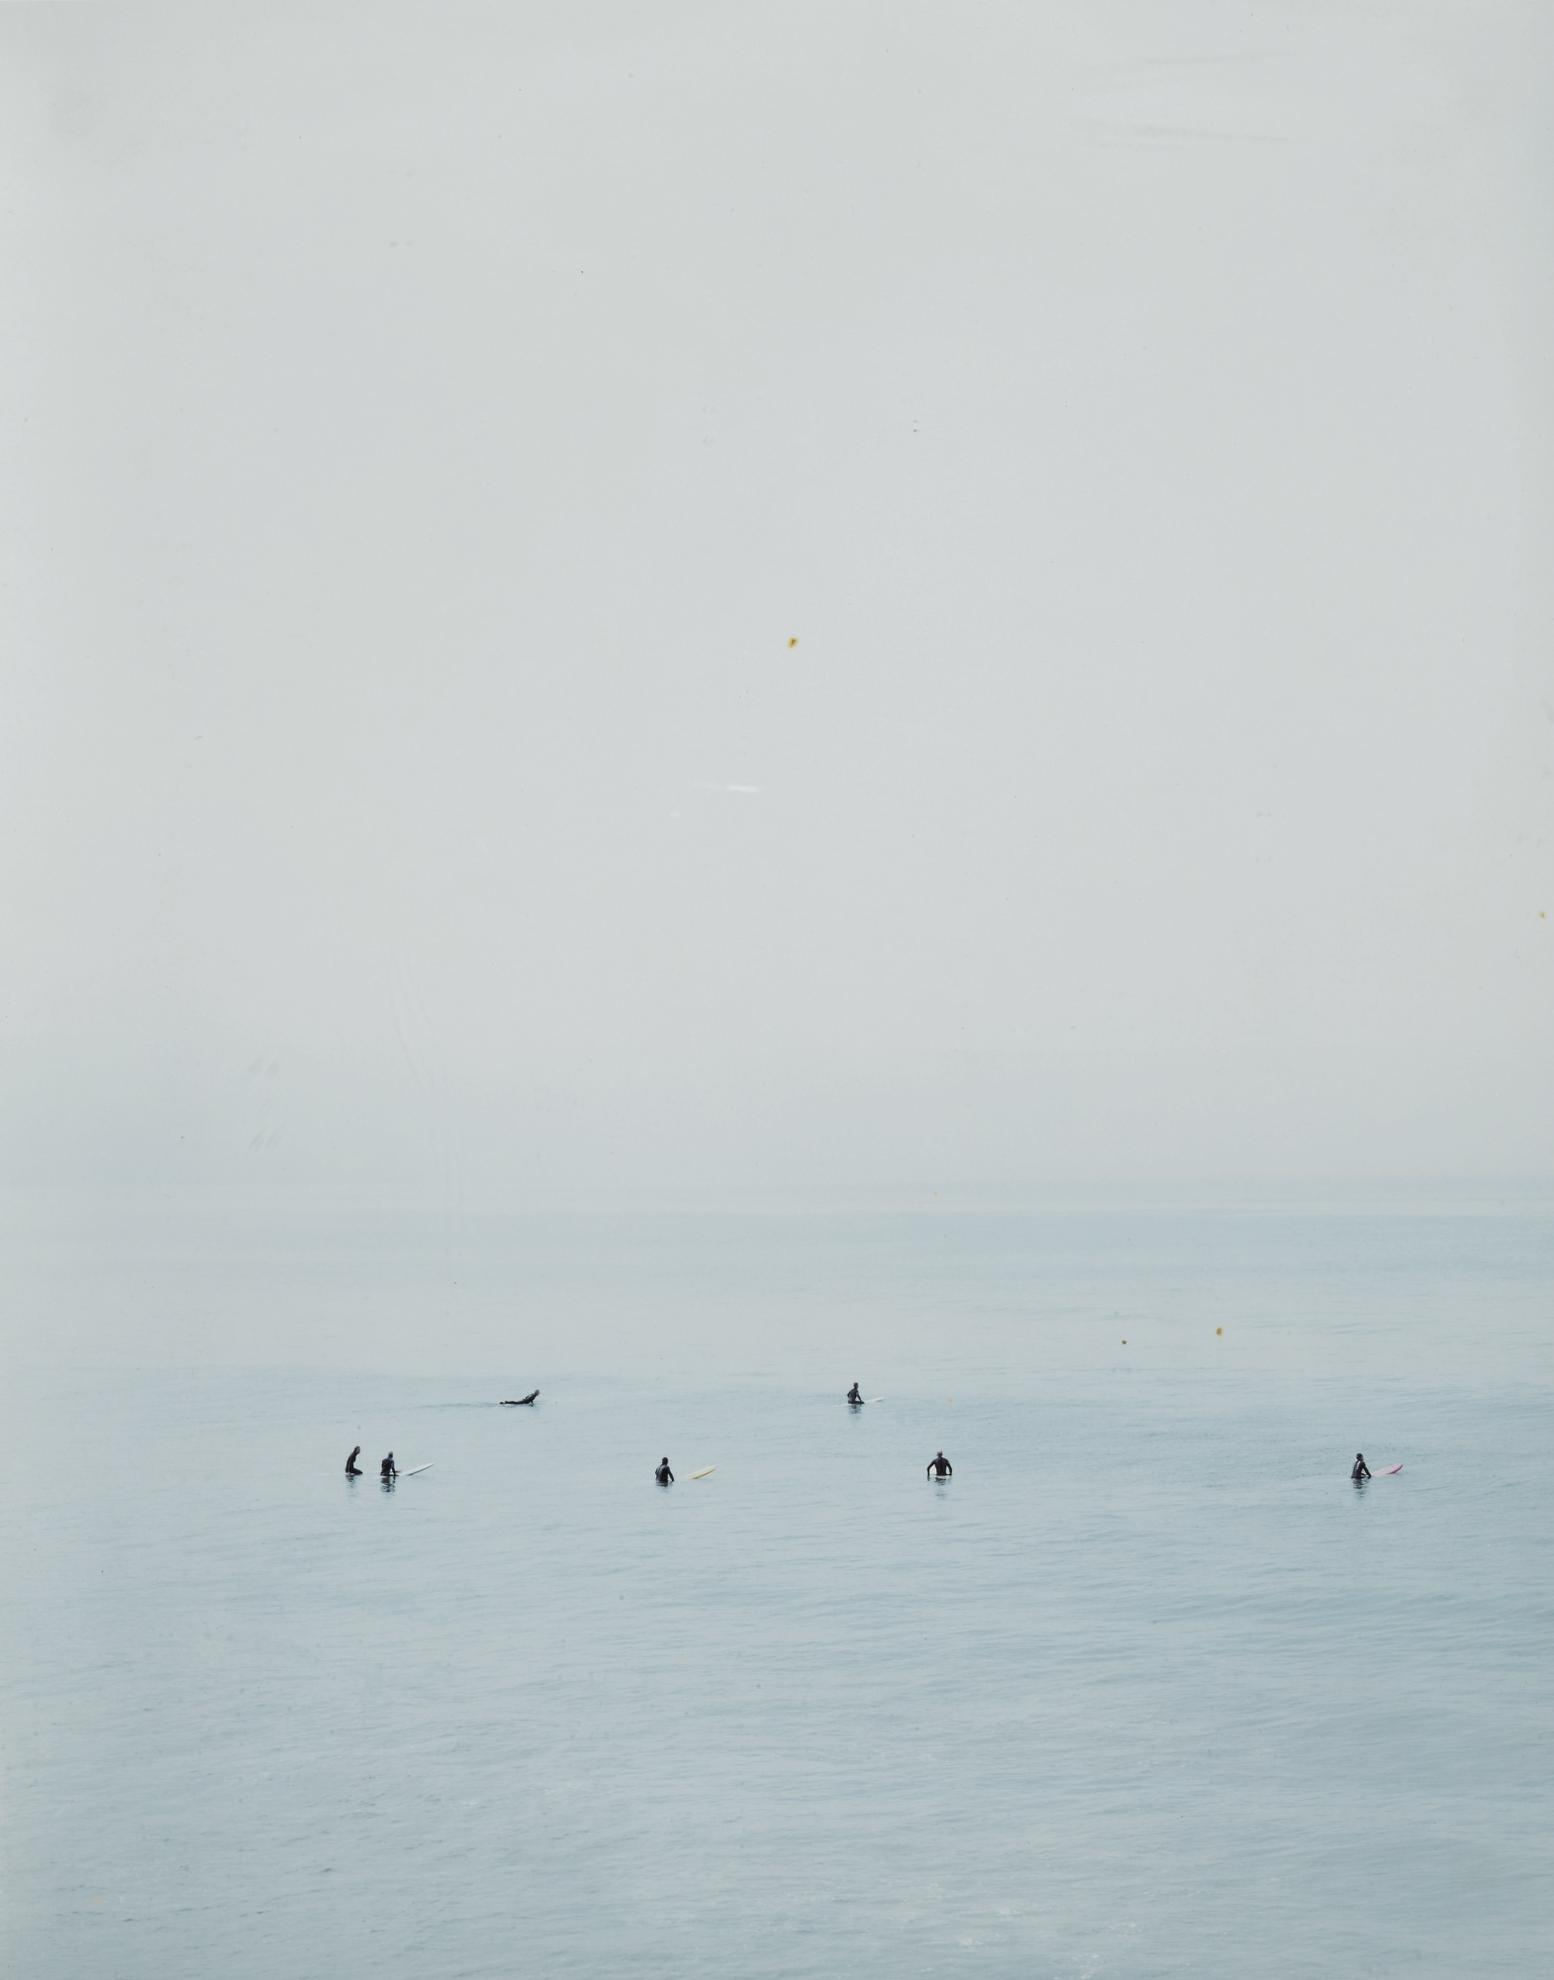 Catherine Opie-Surfers-2003